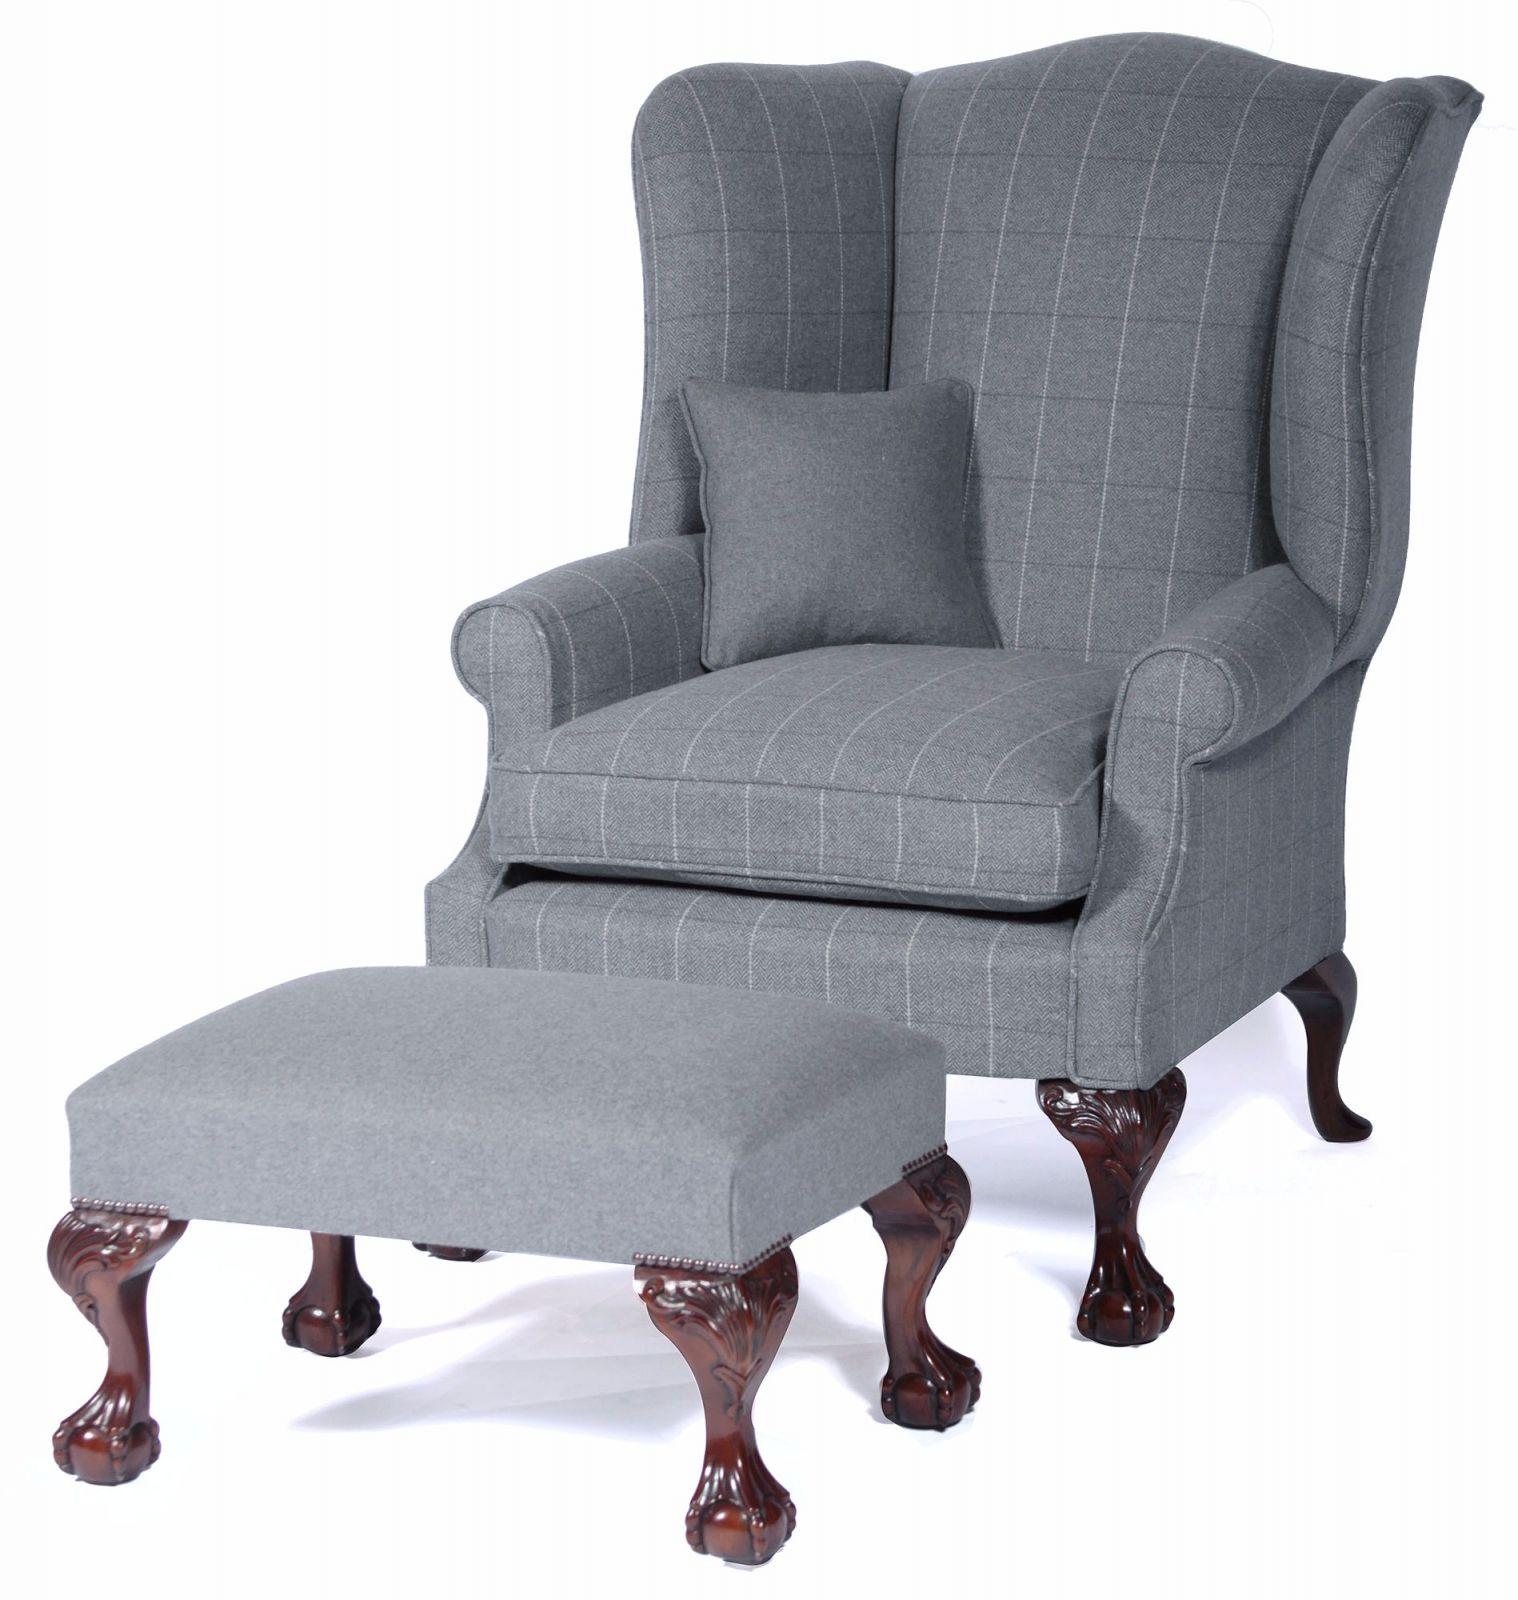 Coleridge wing chair in Merino wool